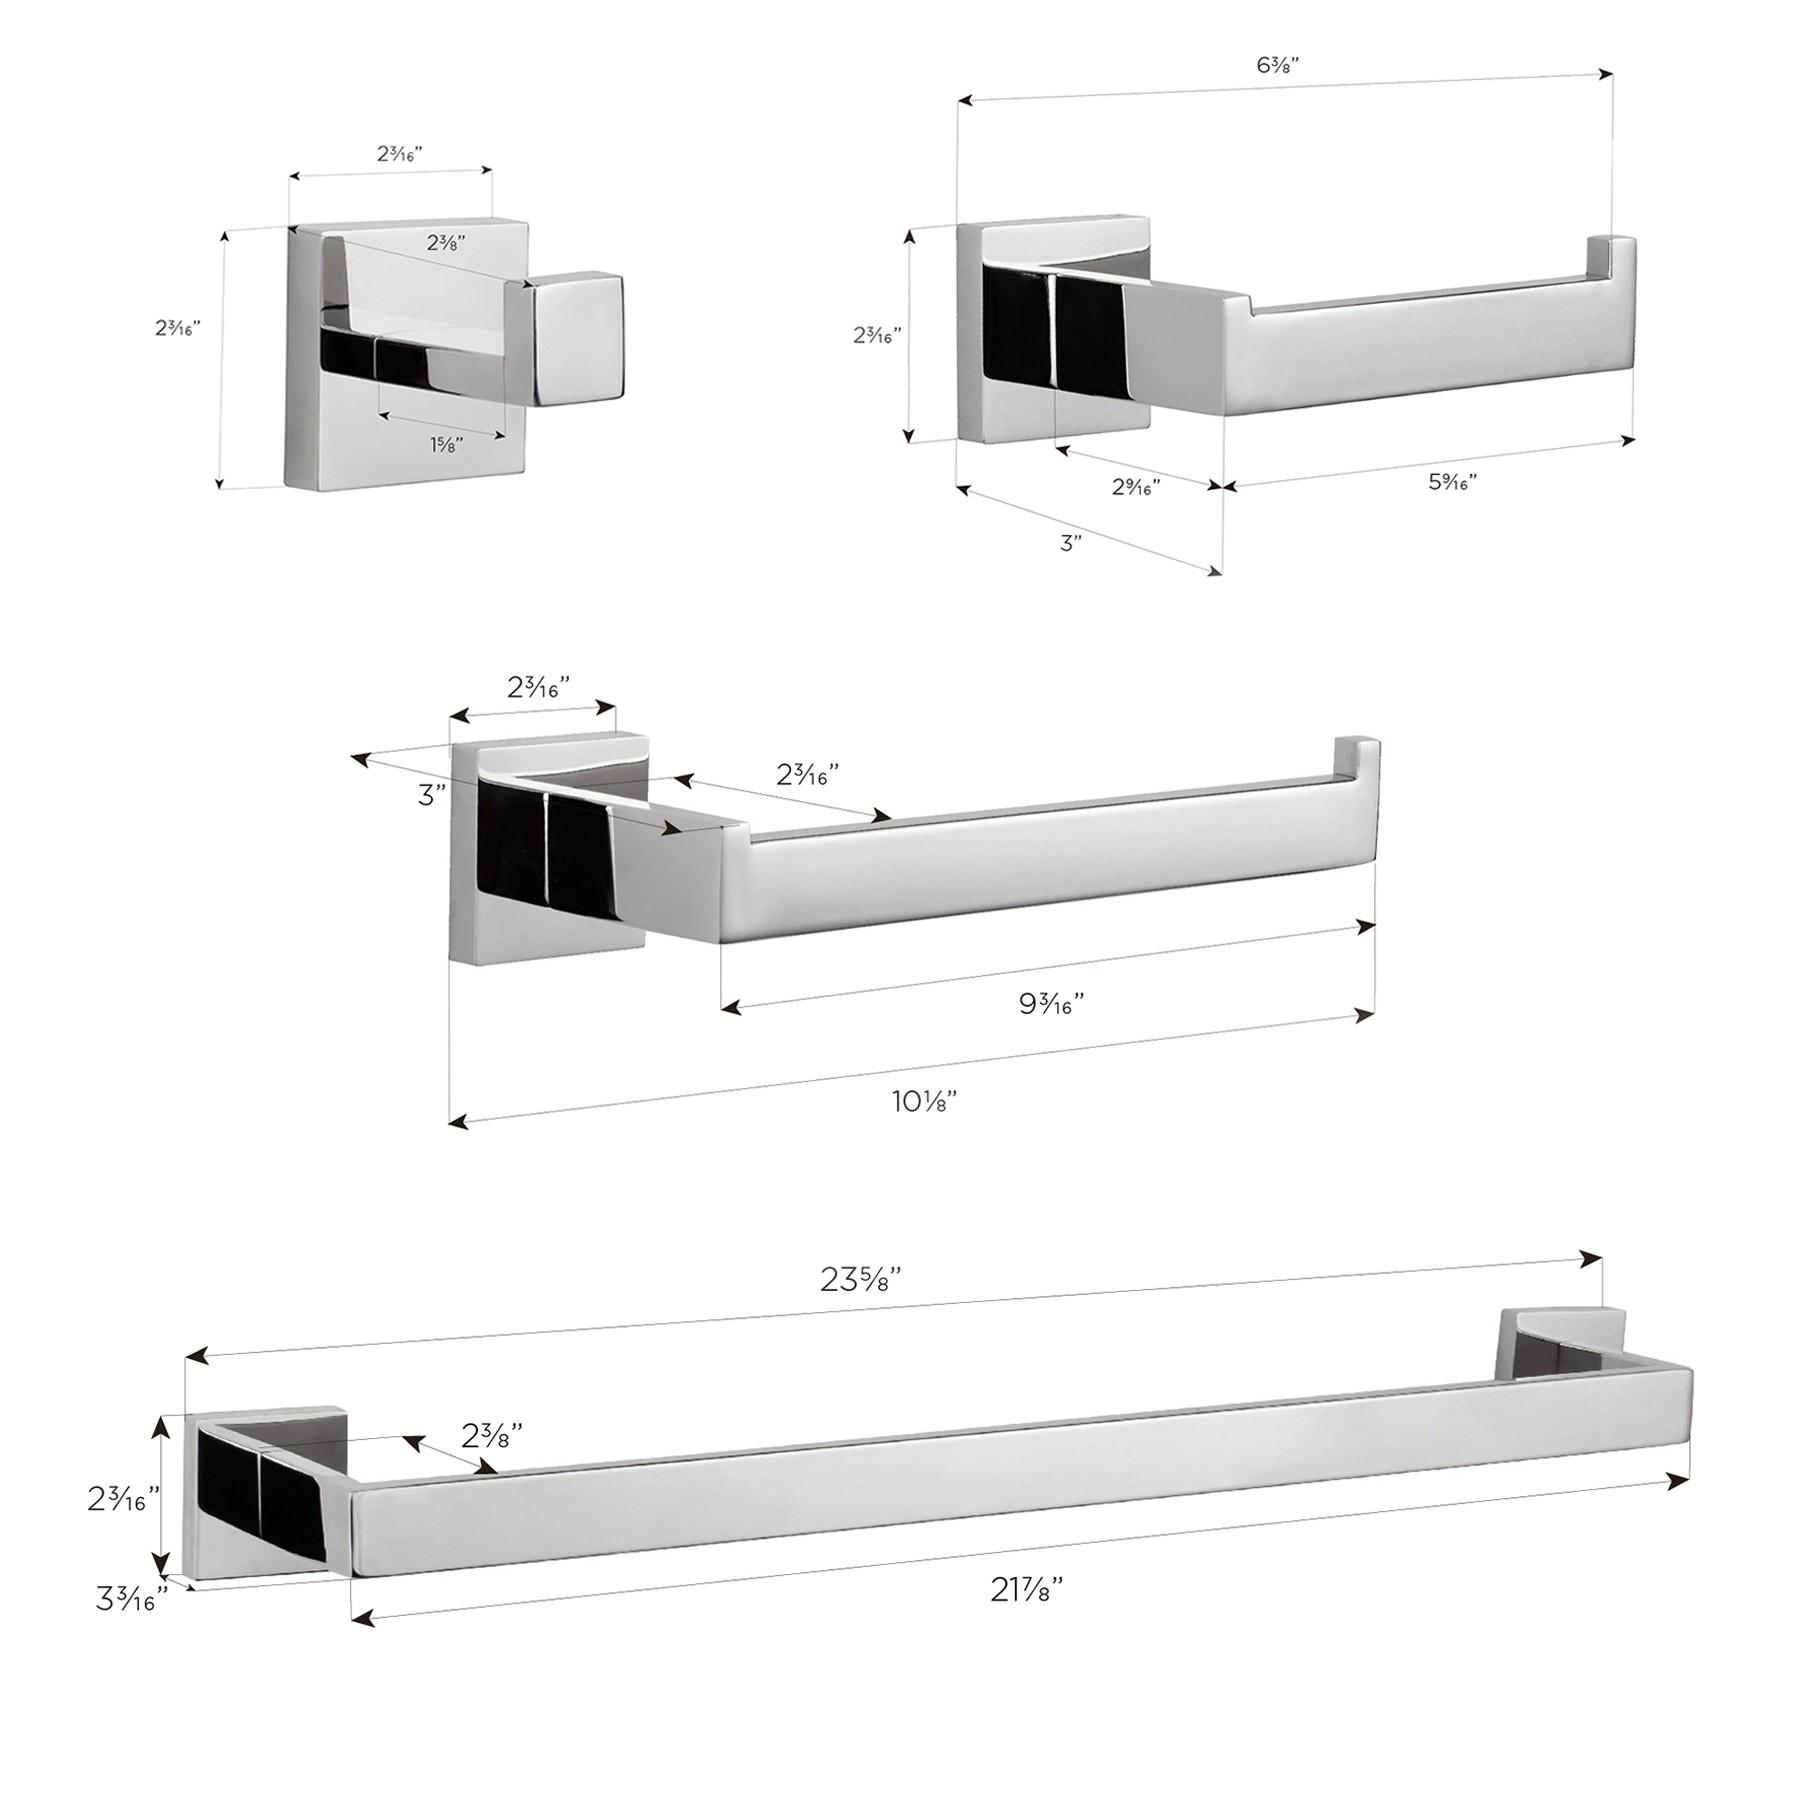 "TriBeCa 4-Piece Bathroom Hardware Set with 24"" Towel Bar, Polished Chrome"